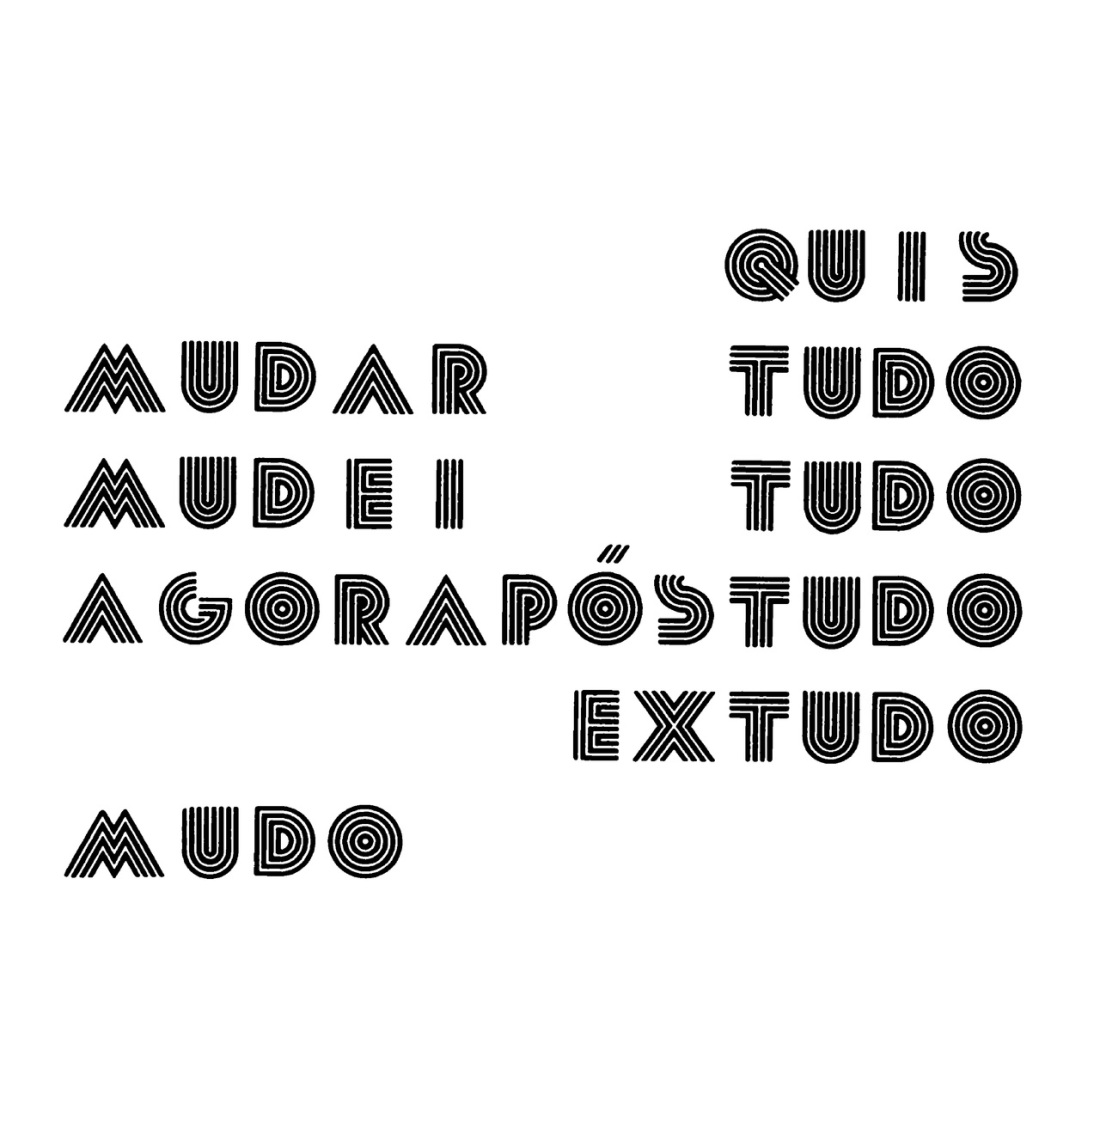 Augusto de Campos - Pós-Tudo